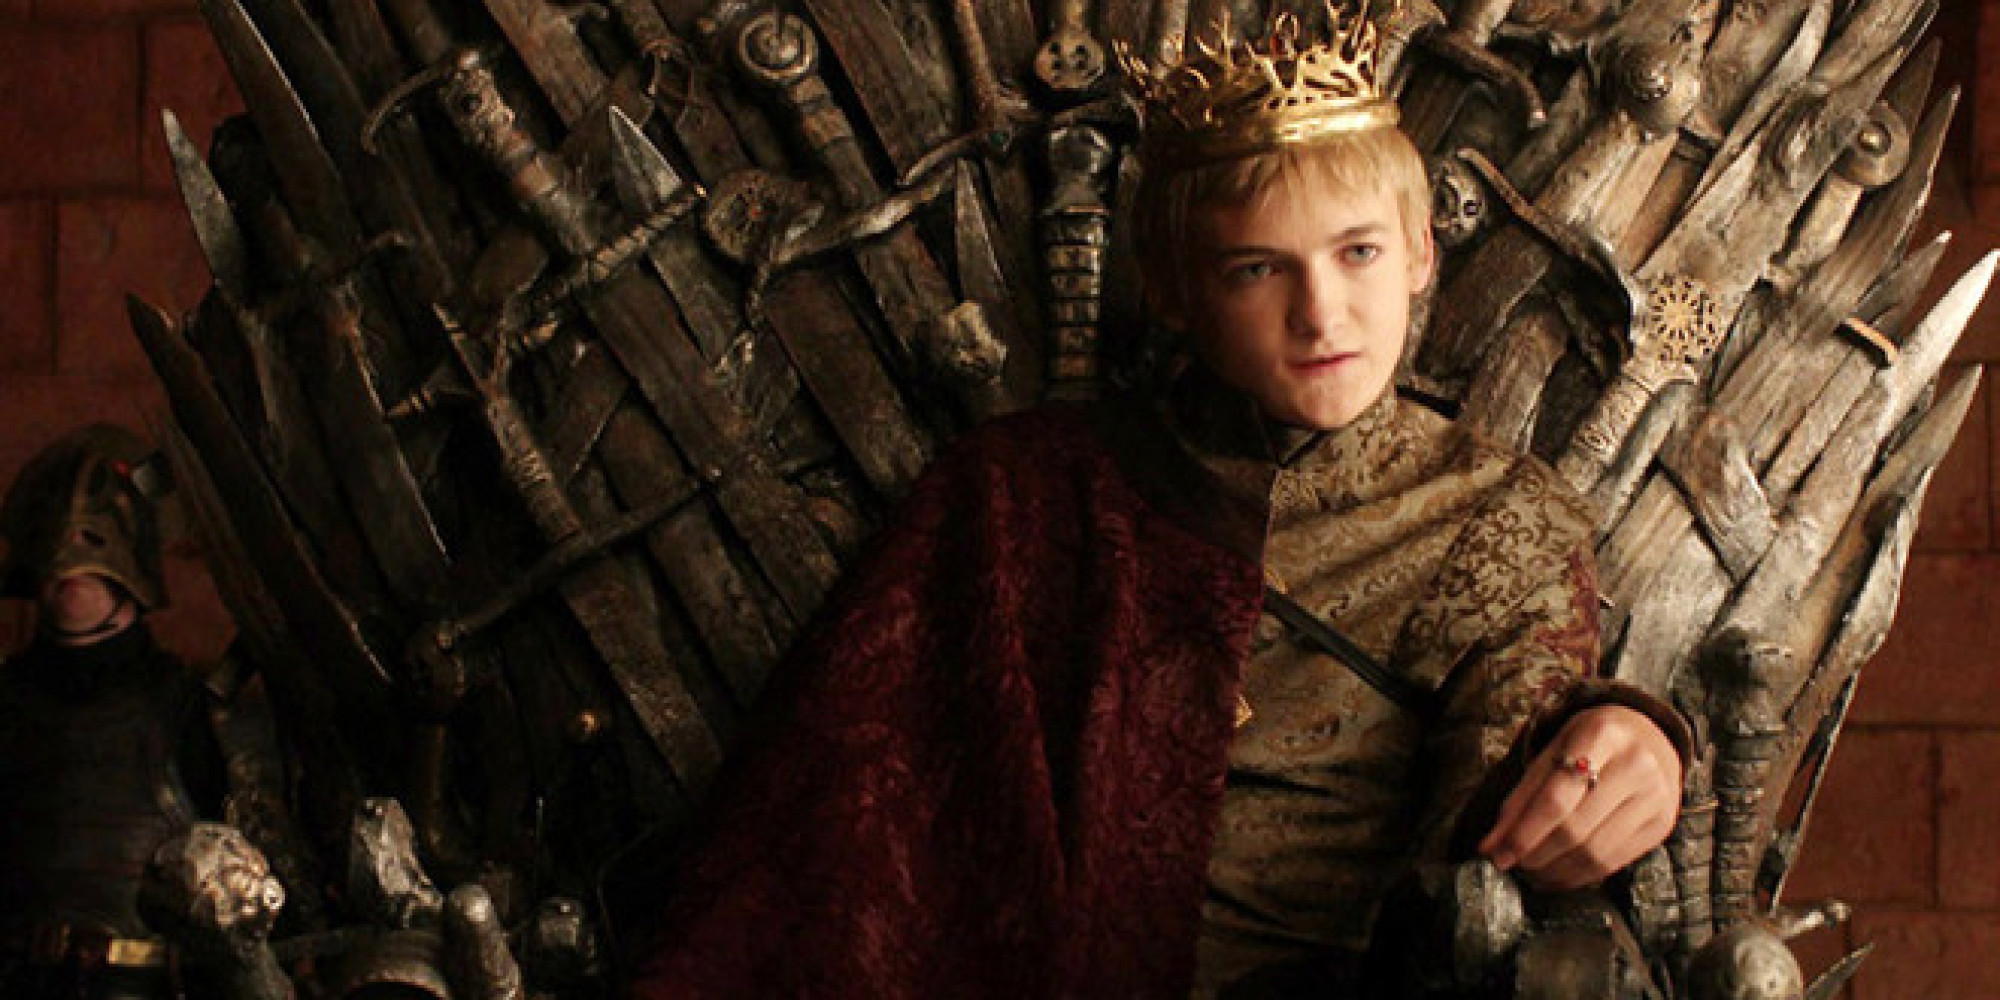 Prince Joffrey Baratheon On The Iron Throne Game Of Thrones